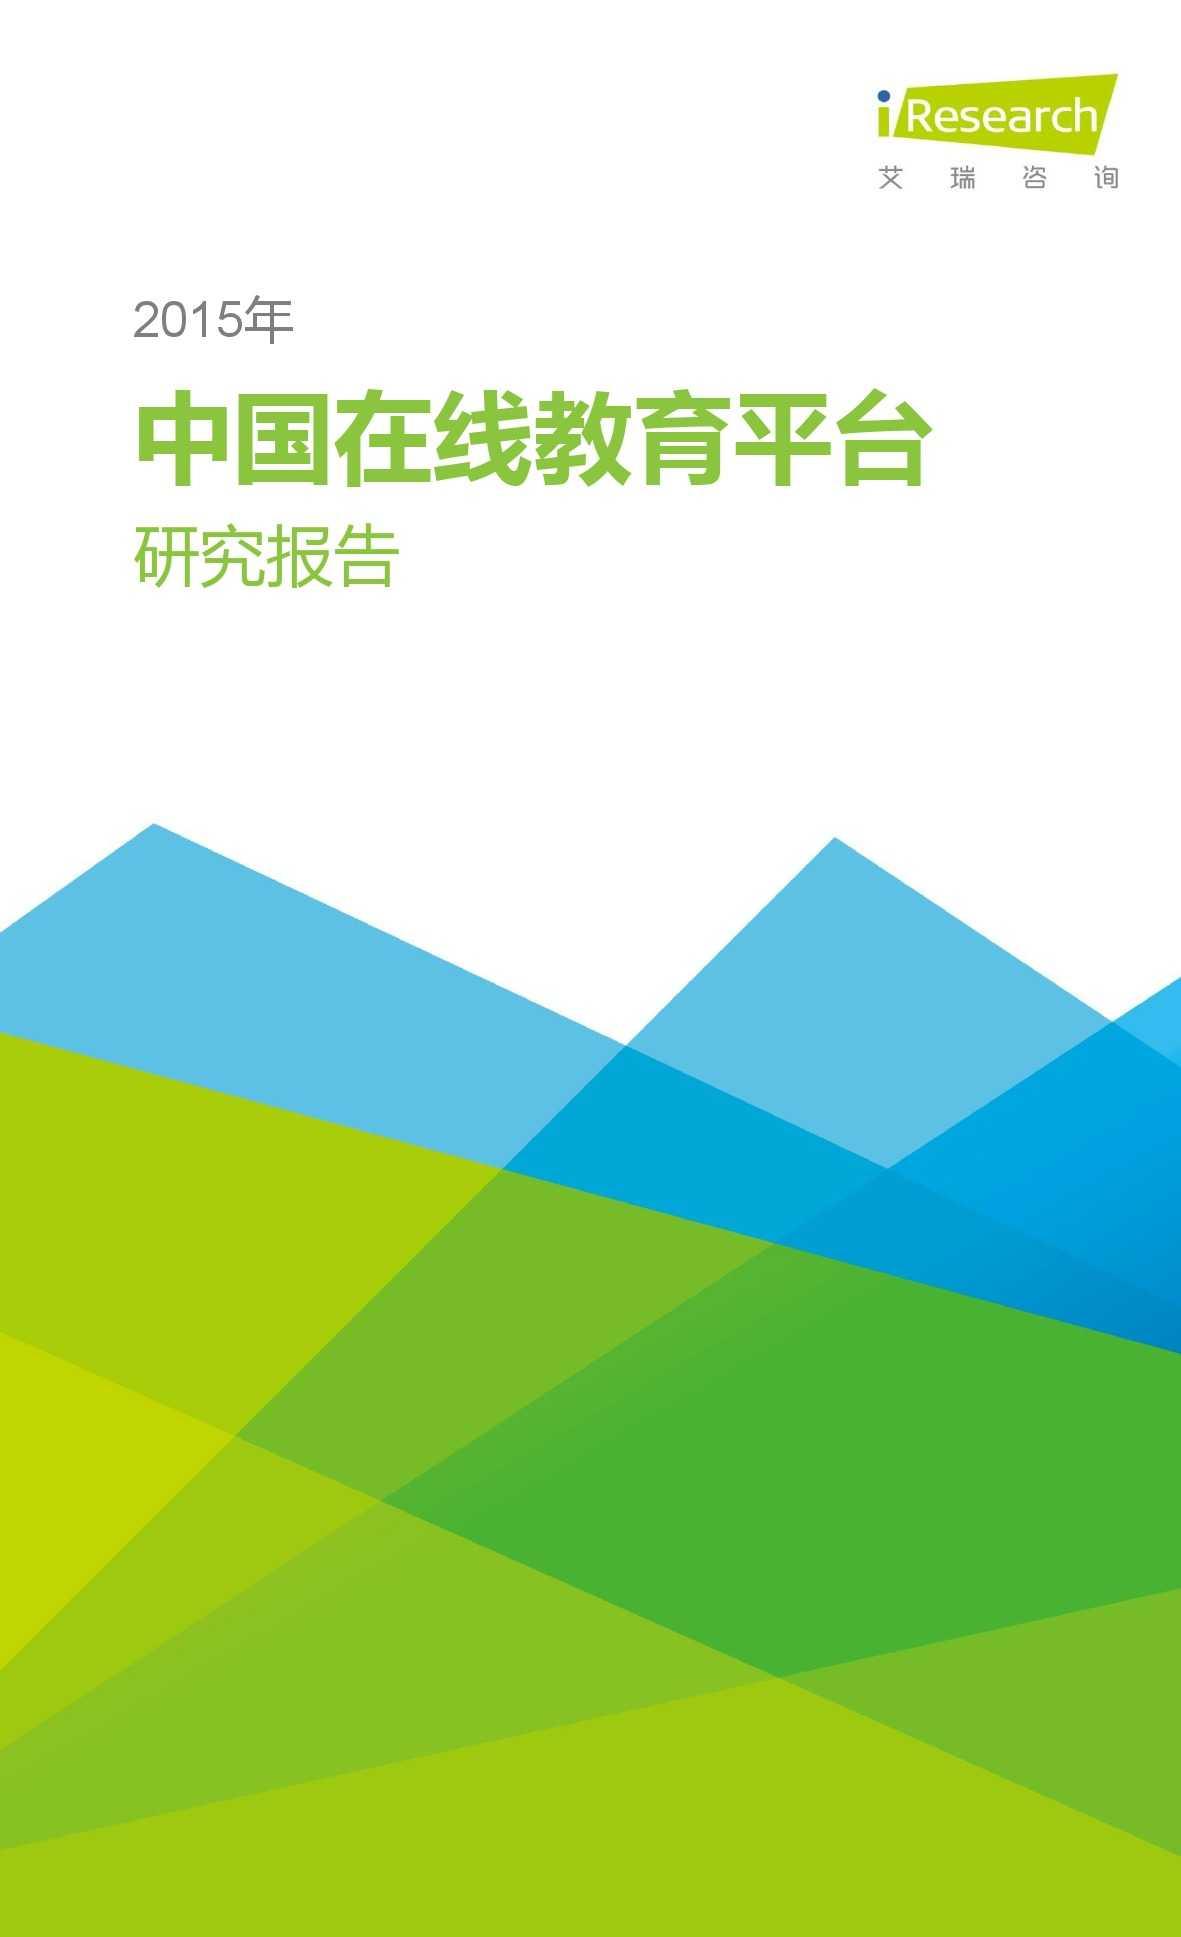 iResearch-2015年中国在线教育平台研究报告_000001